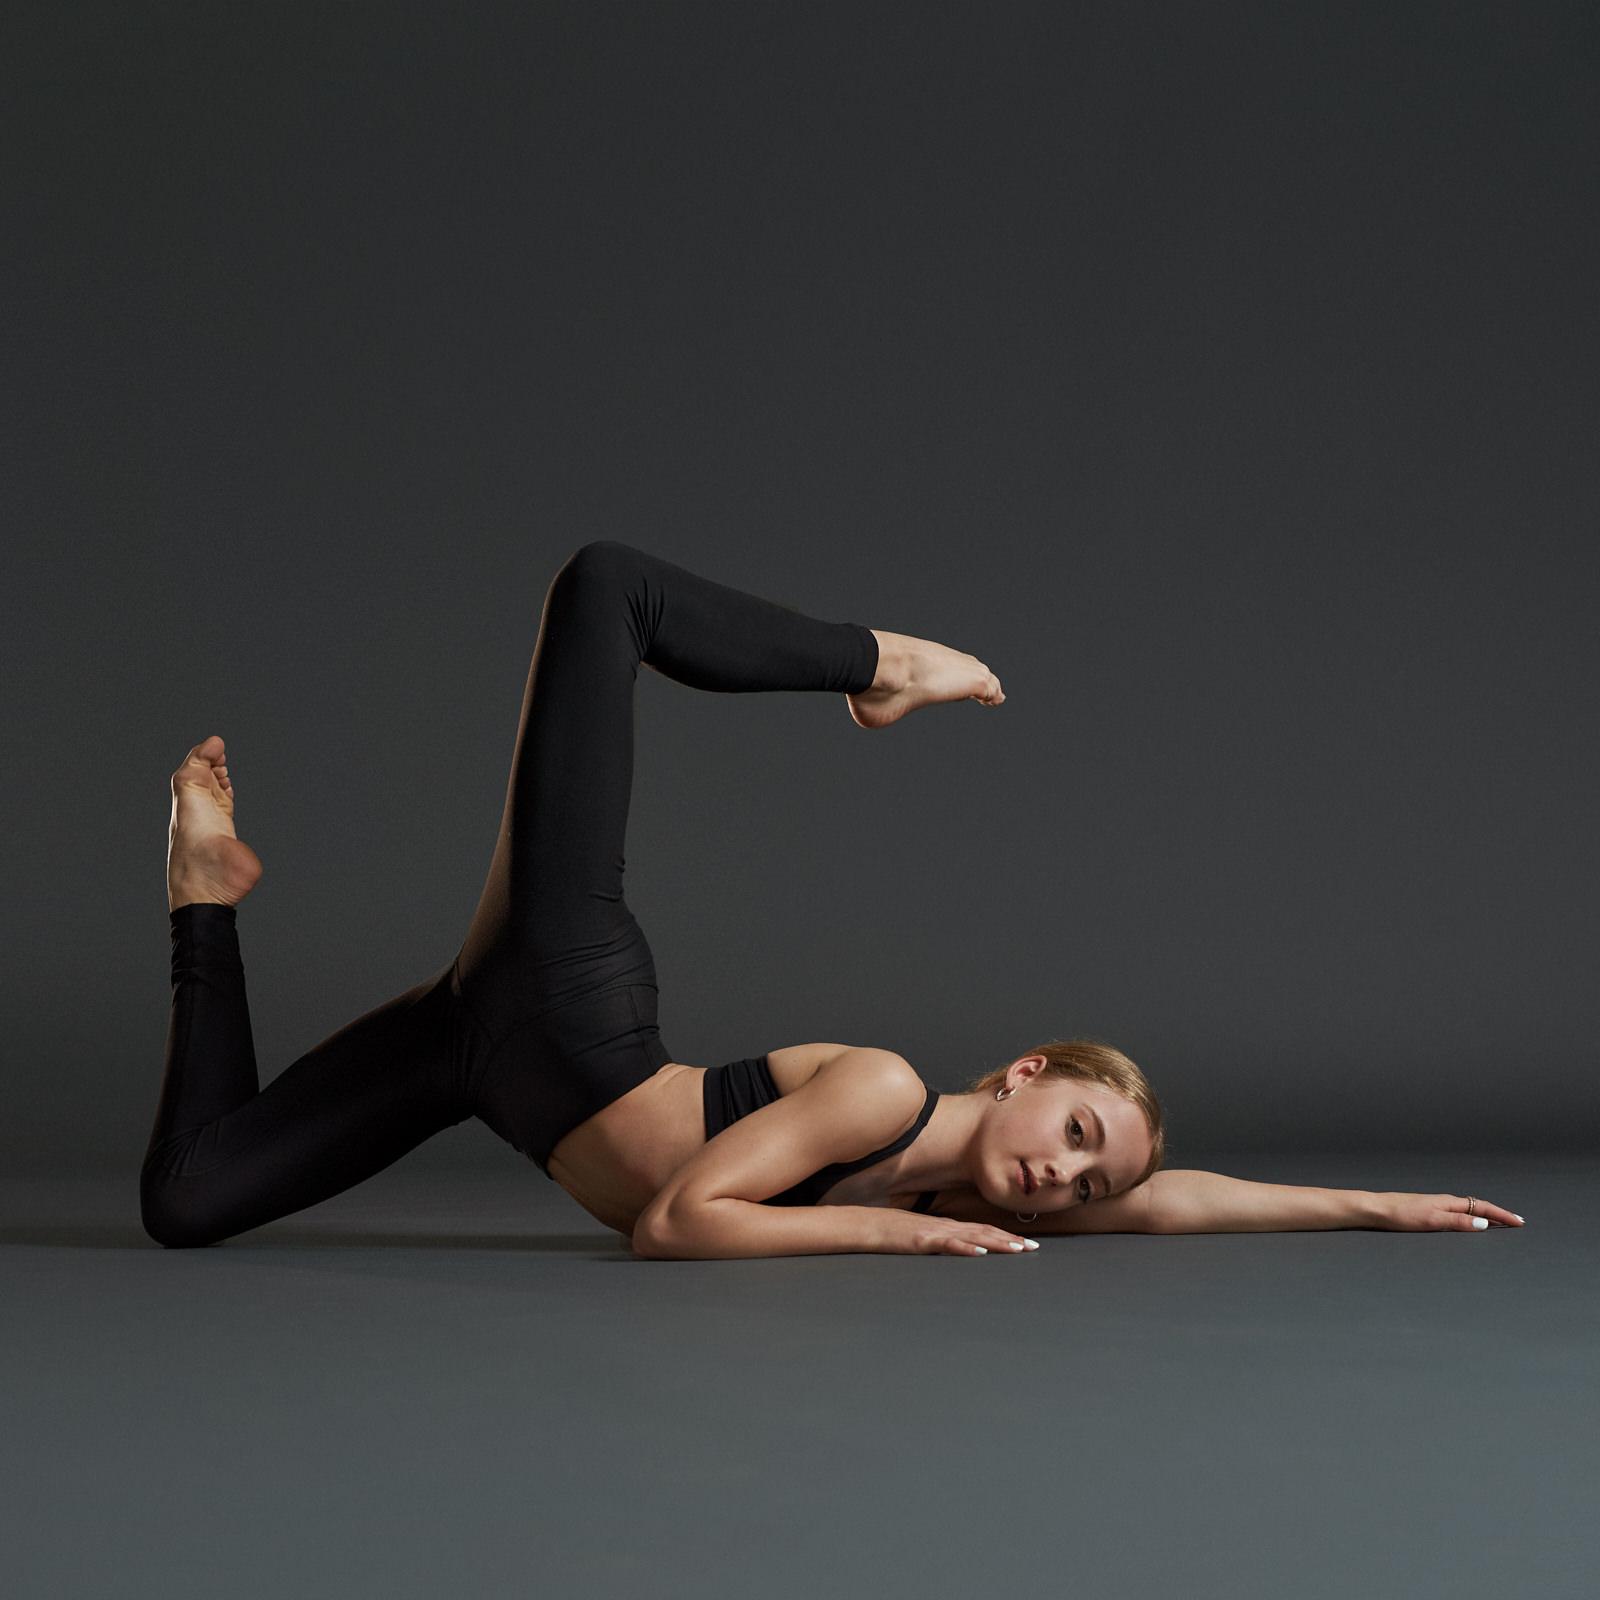 dance-photographer-marcus-roy-hoffman-2.jpg